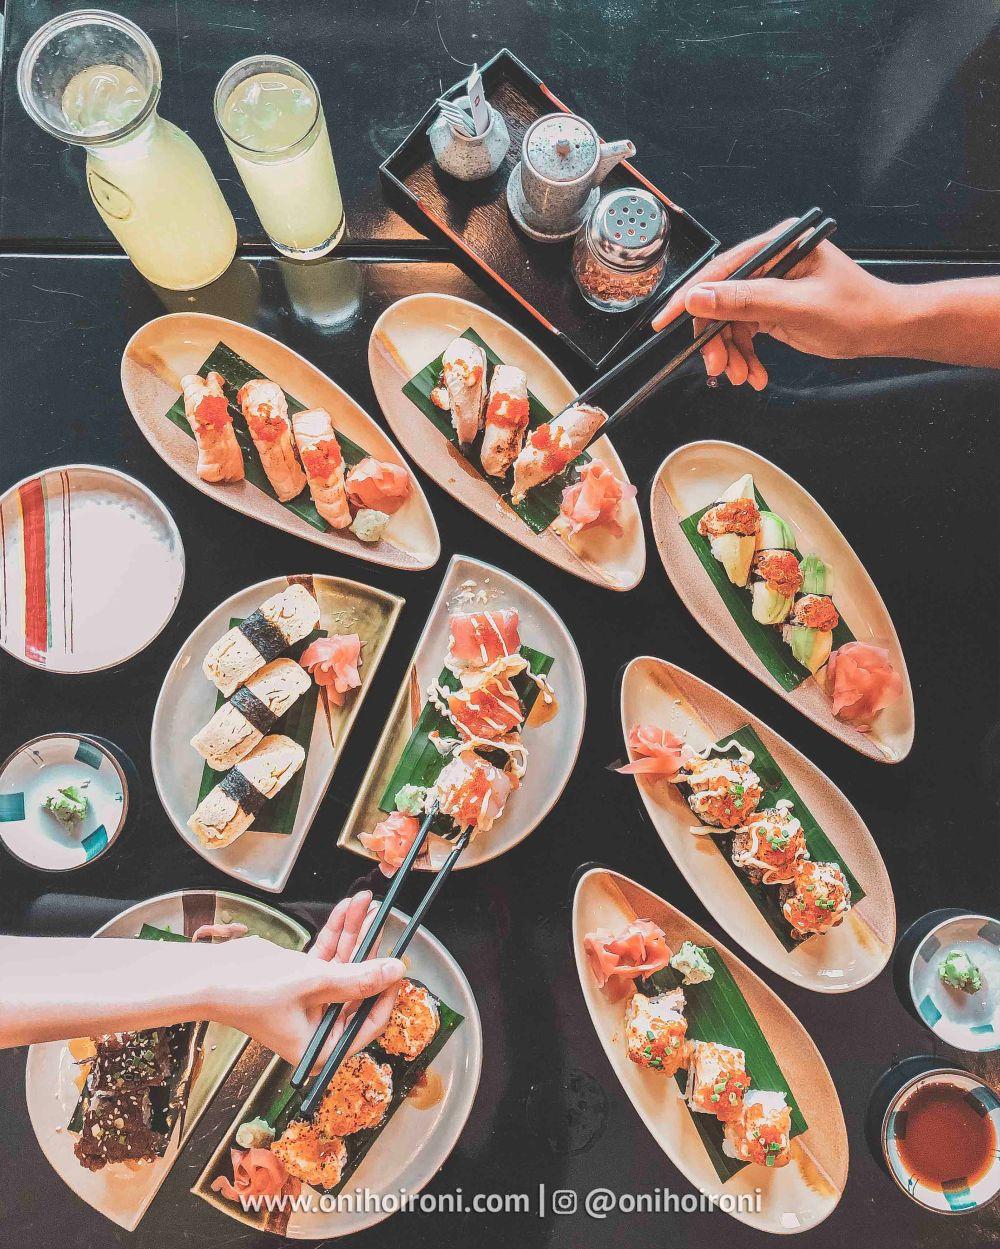 1Review food makanan Nishimura restaurant Shangrila Surabaya Hotel Oni hoironi